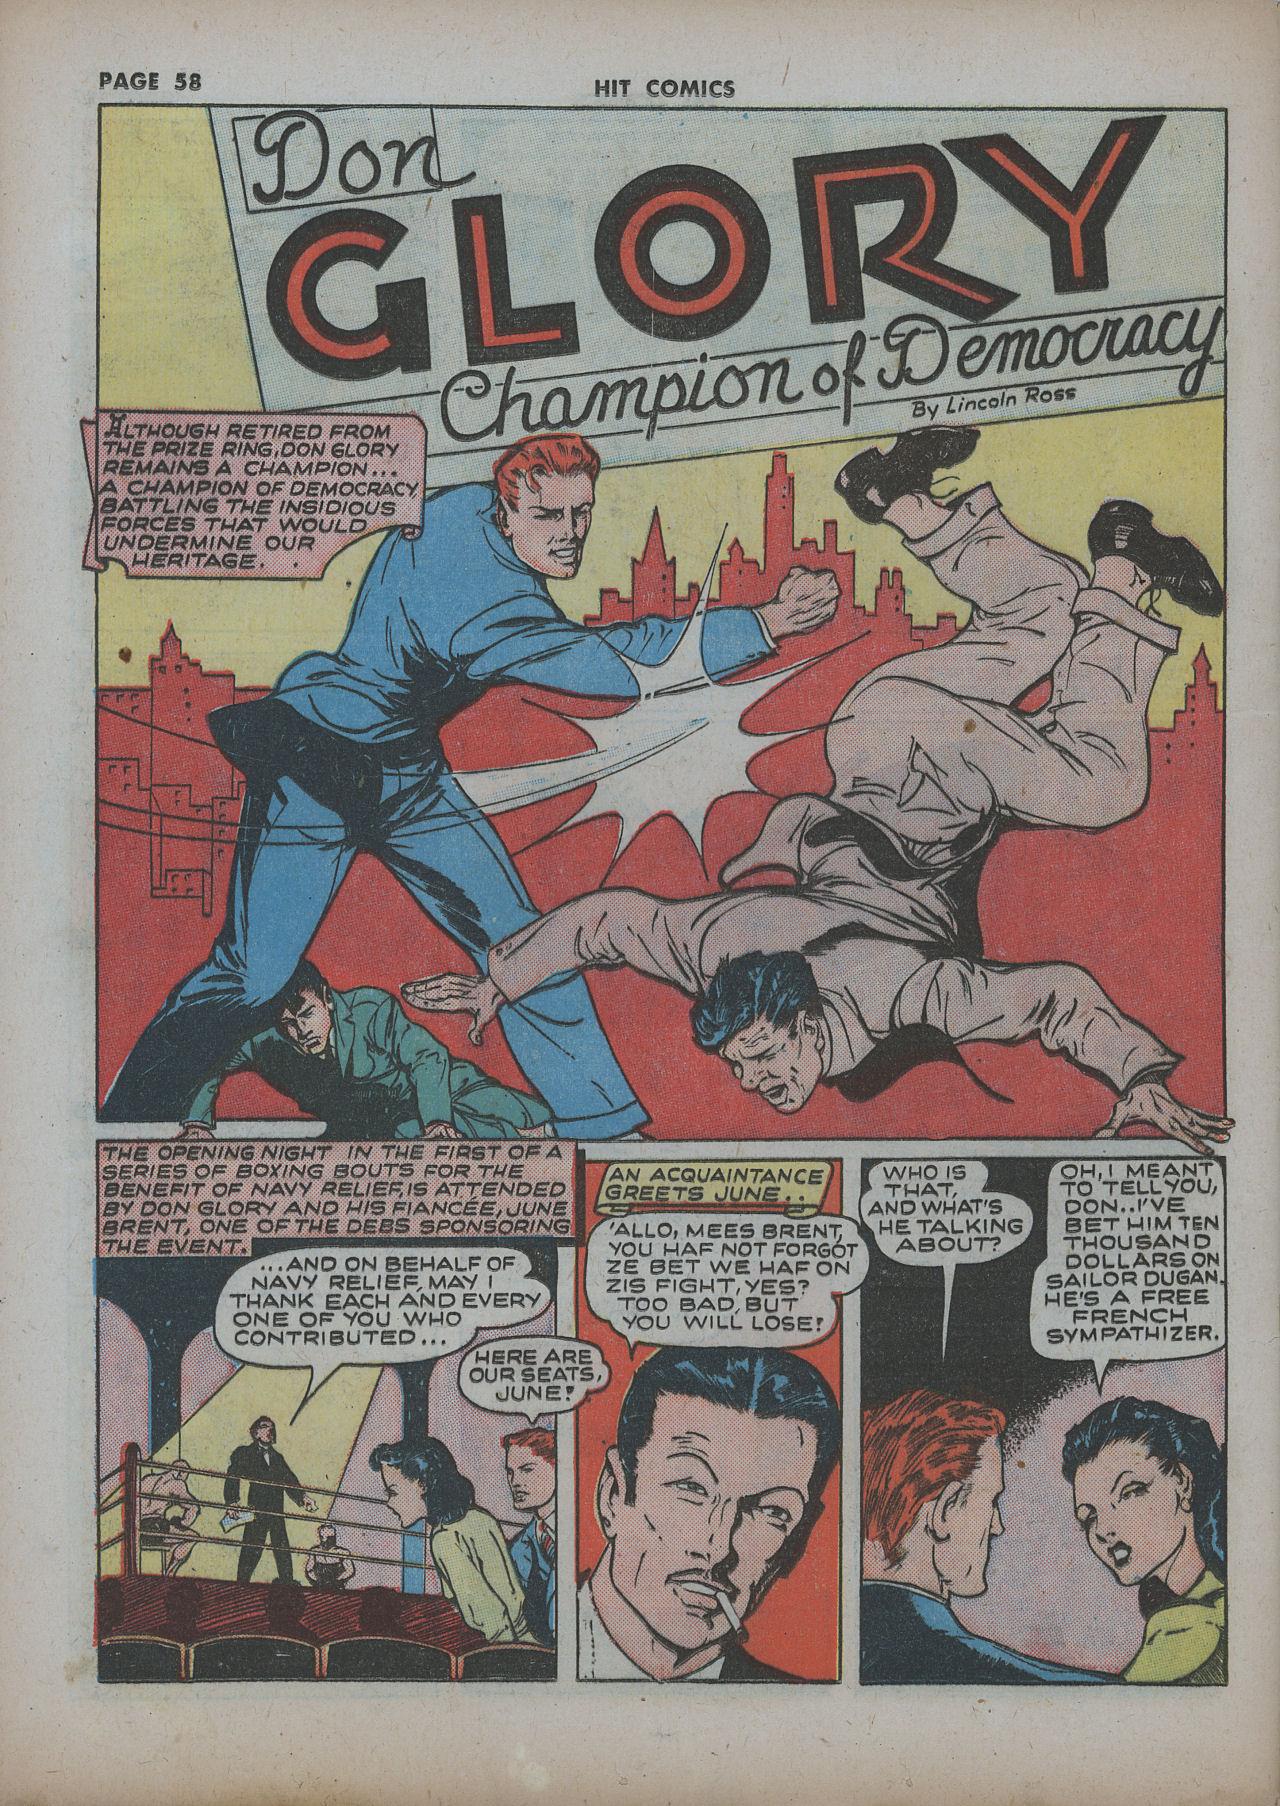 Read online Hit Comics comic -  Issue #22 - 60